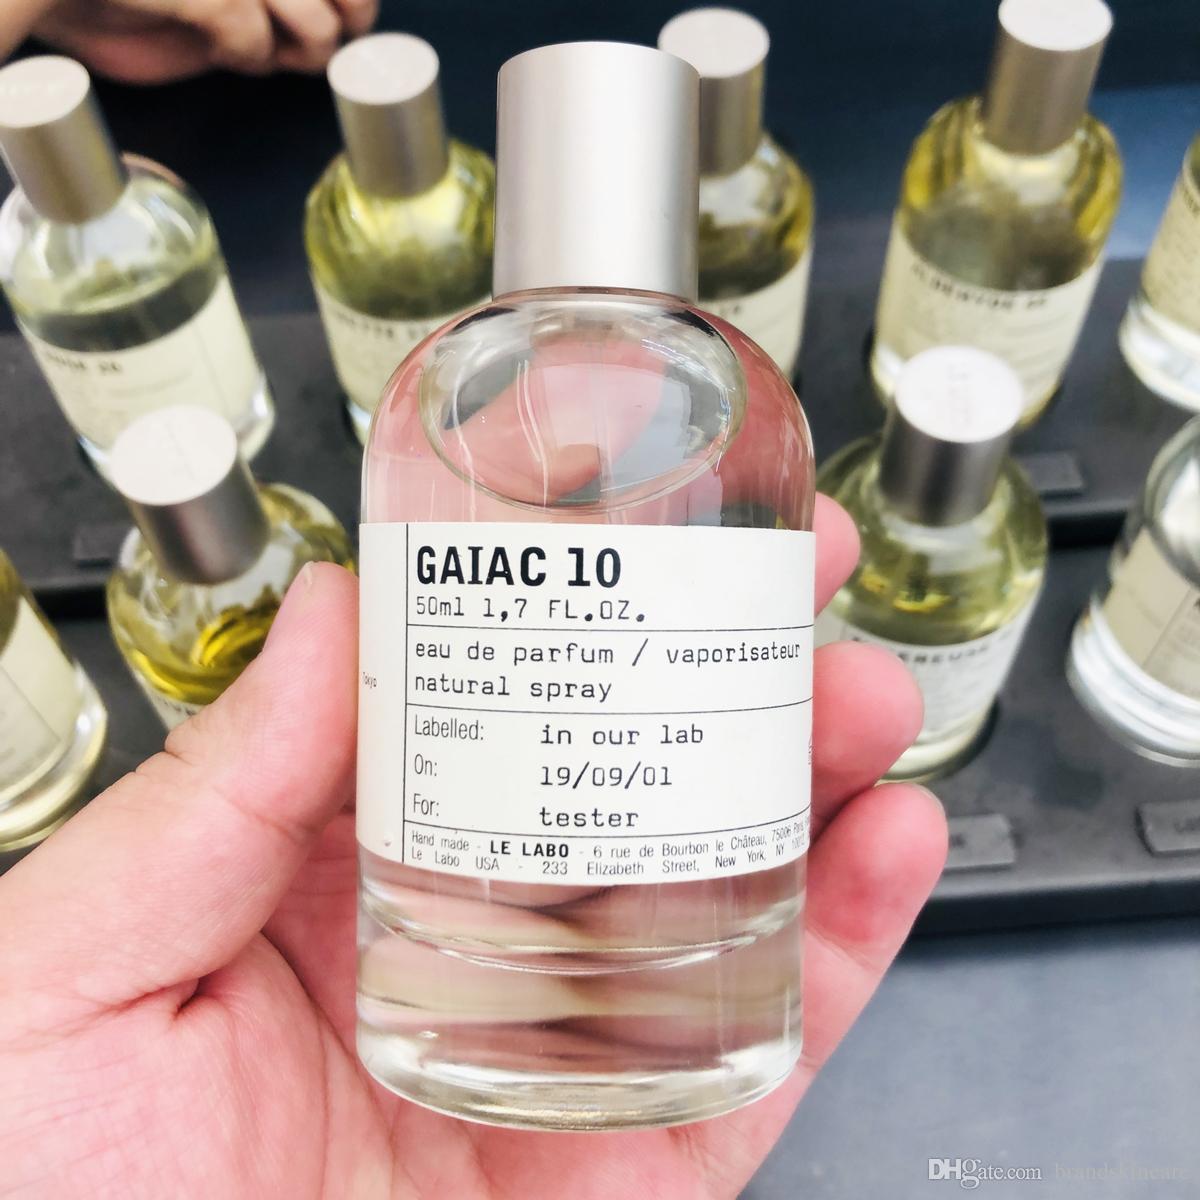 Le Labo perfume Neutro 100ml Santal 33 Bergamote 22 Rose 31 A Noir 29 Longo Marca Perfumes duradoura navio livre fragrância